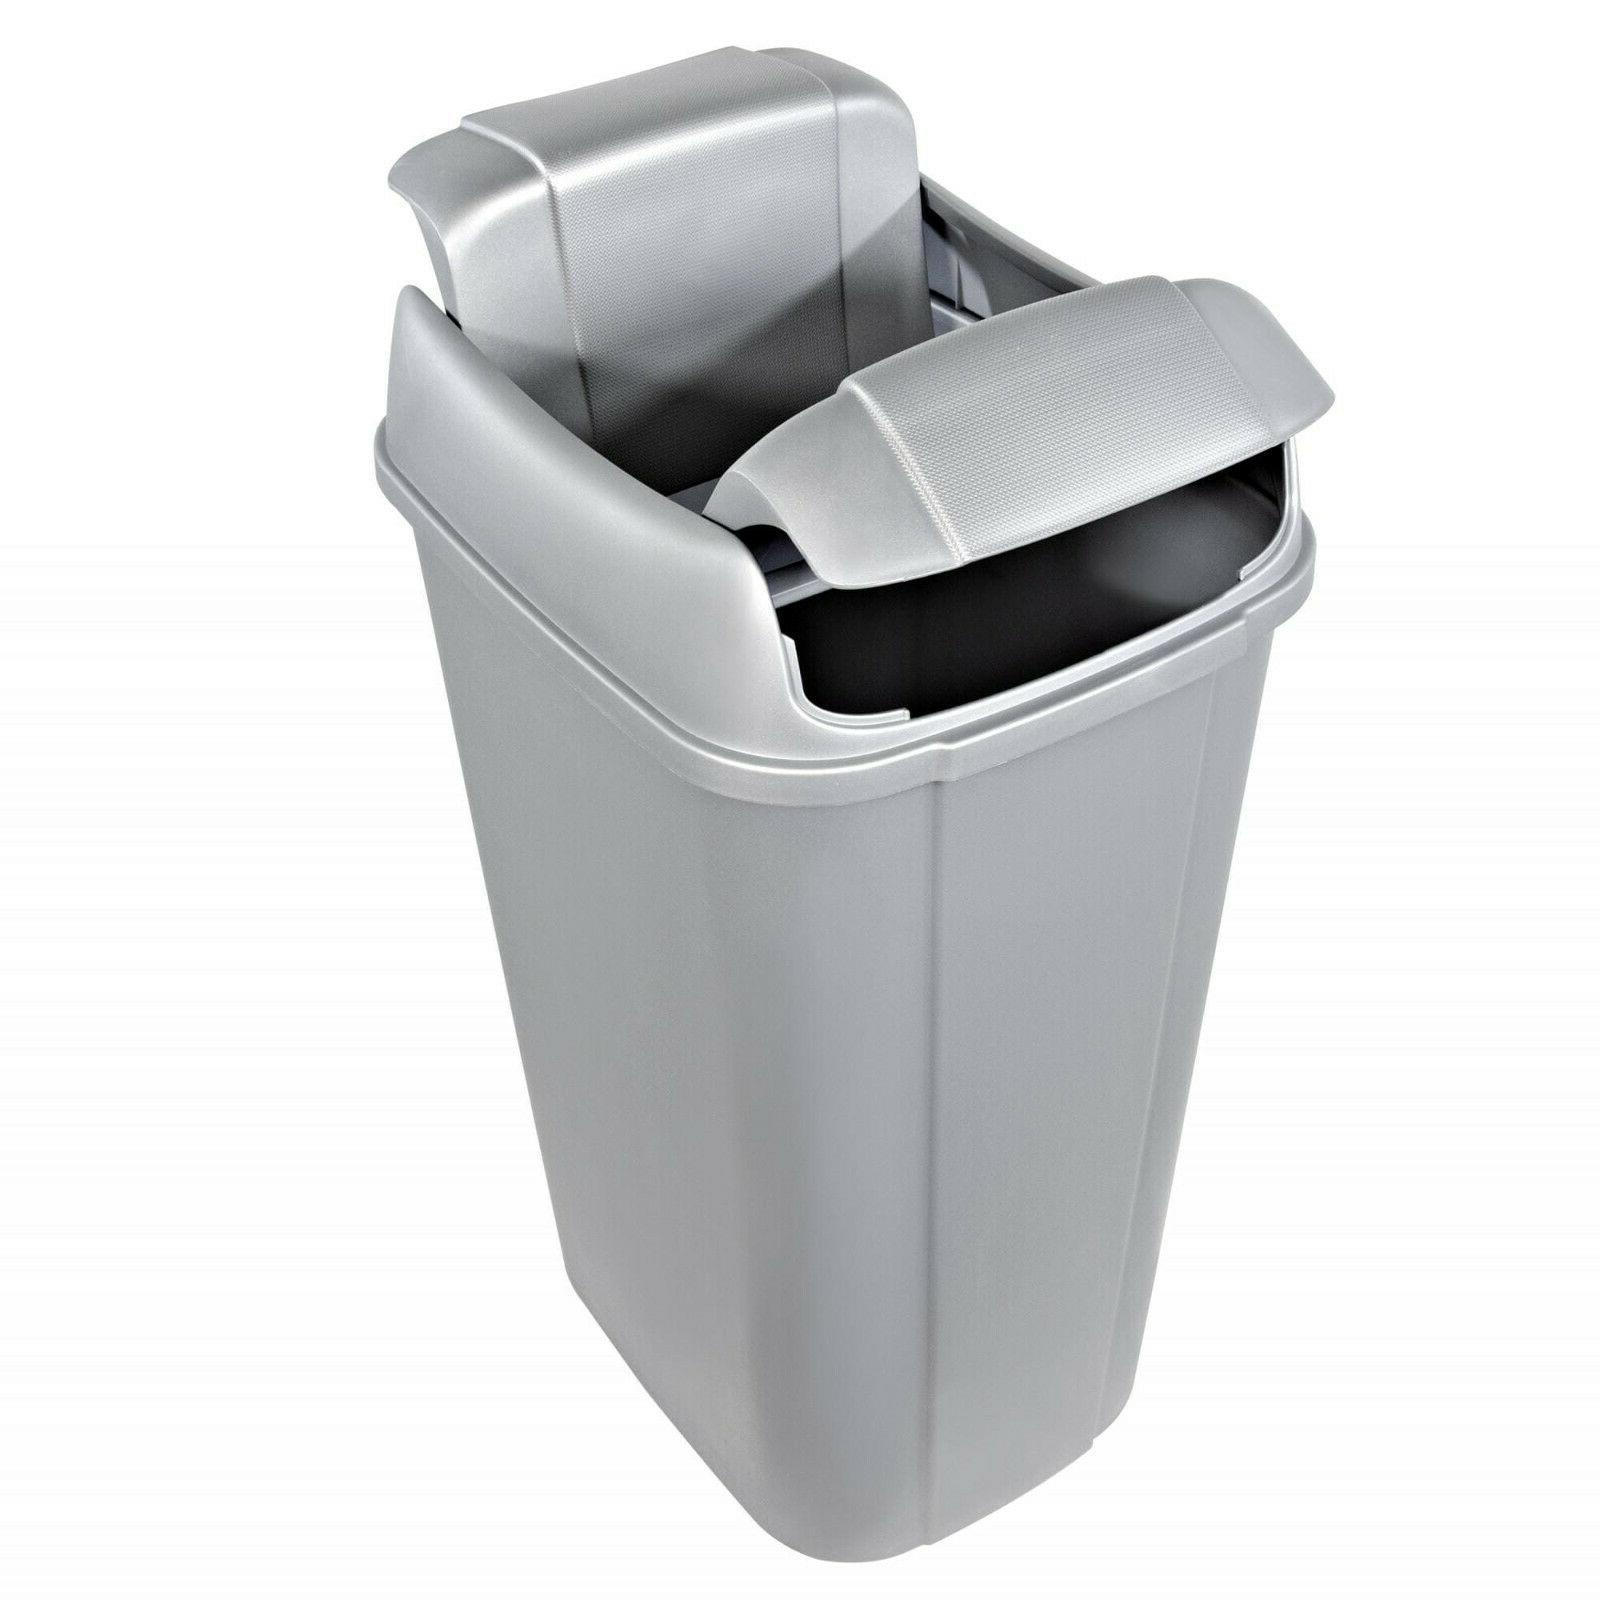 13.3-gallon Hefty Pivot Trash Can, Silver Decorative Texture